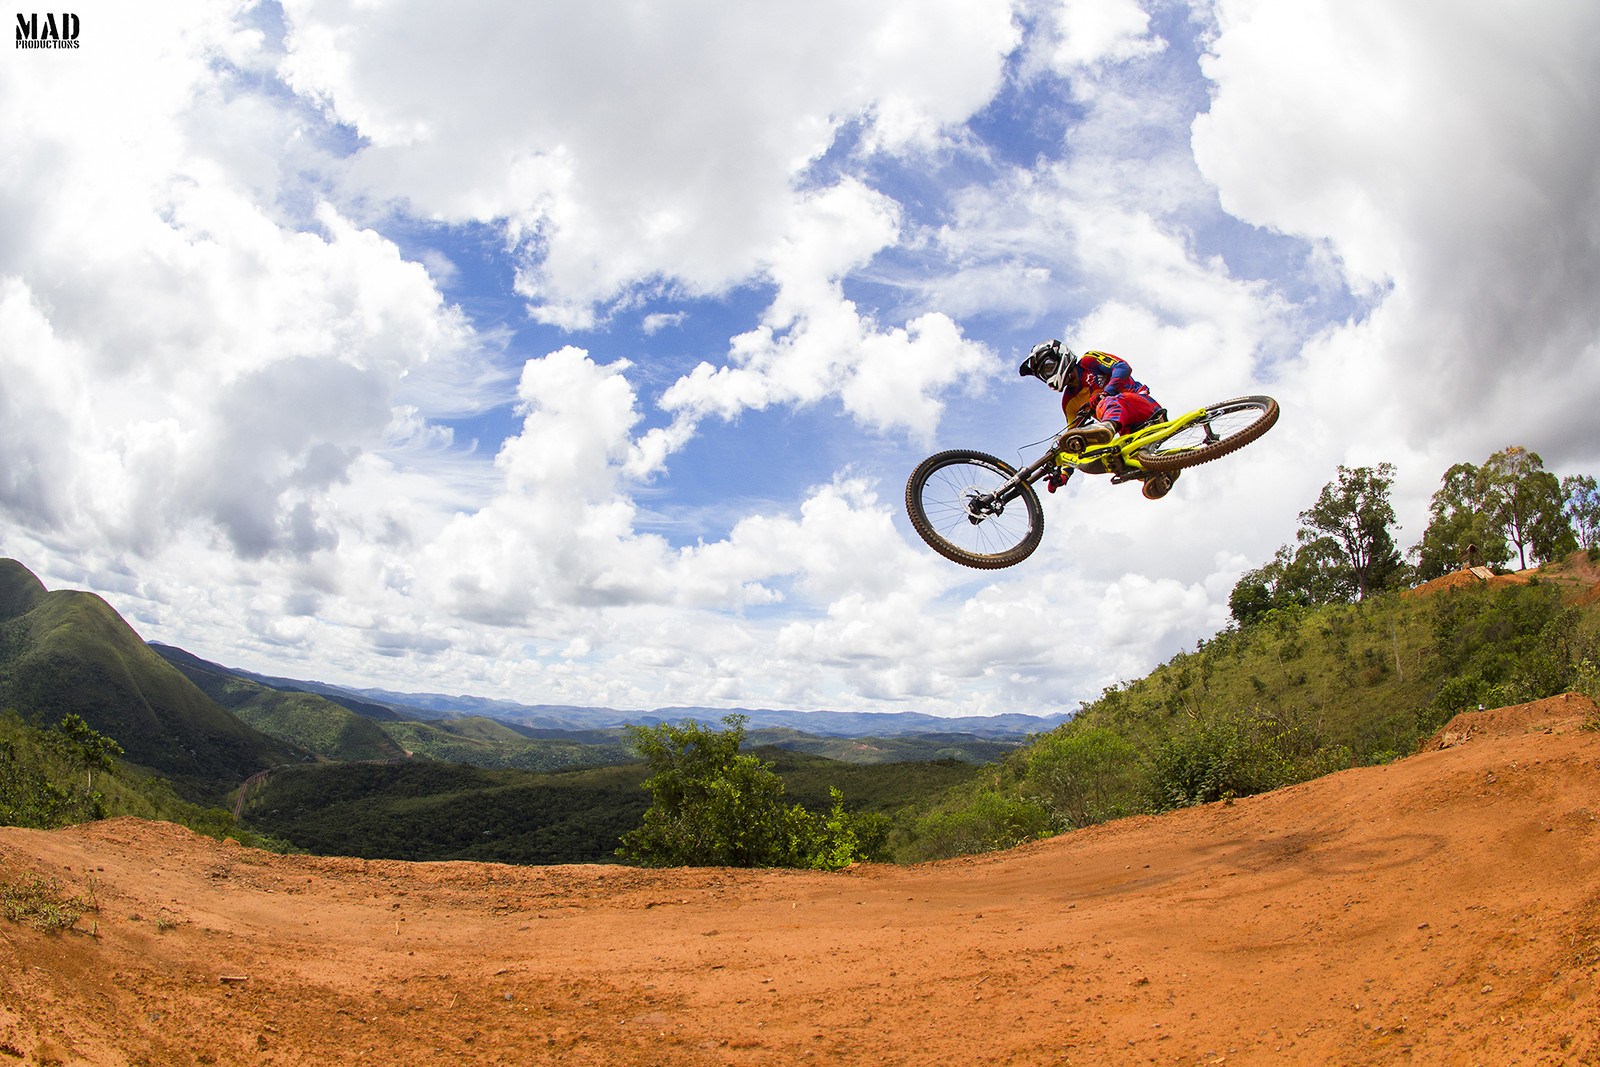 Bernardo Whip Training Center - madproductions - Mountain Biking Pictures - Vital MTB